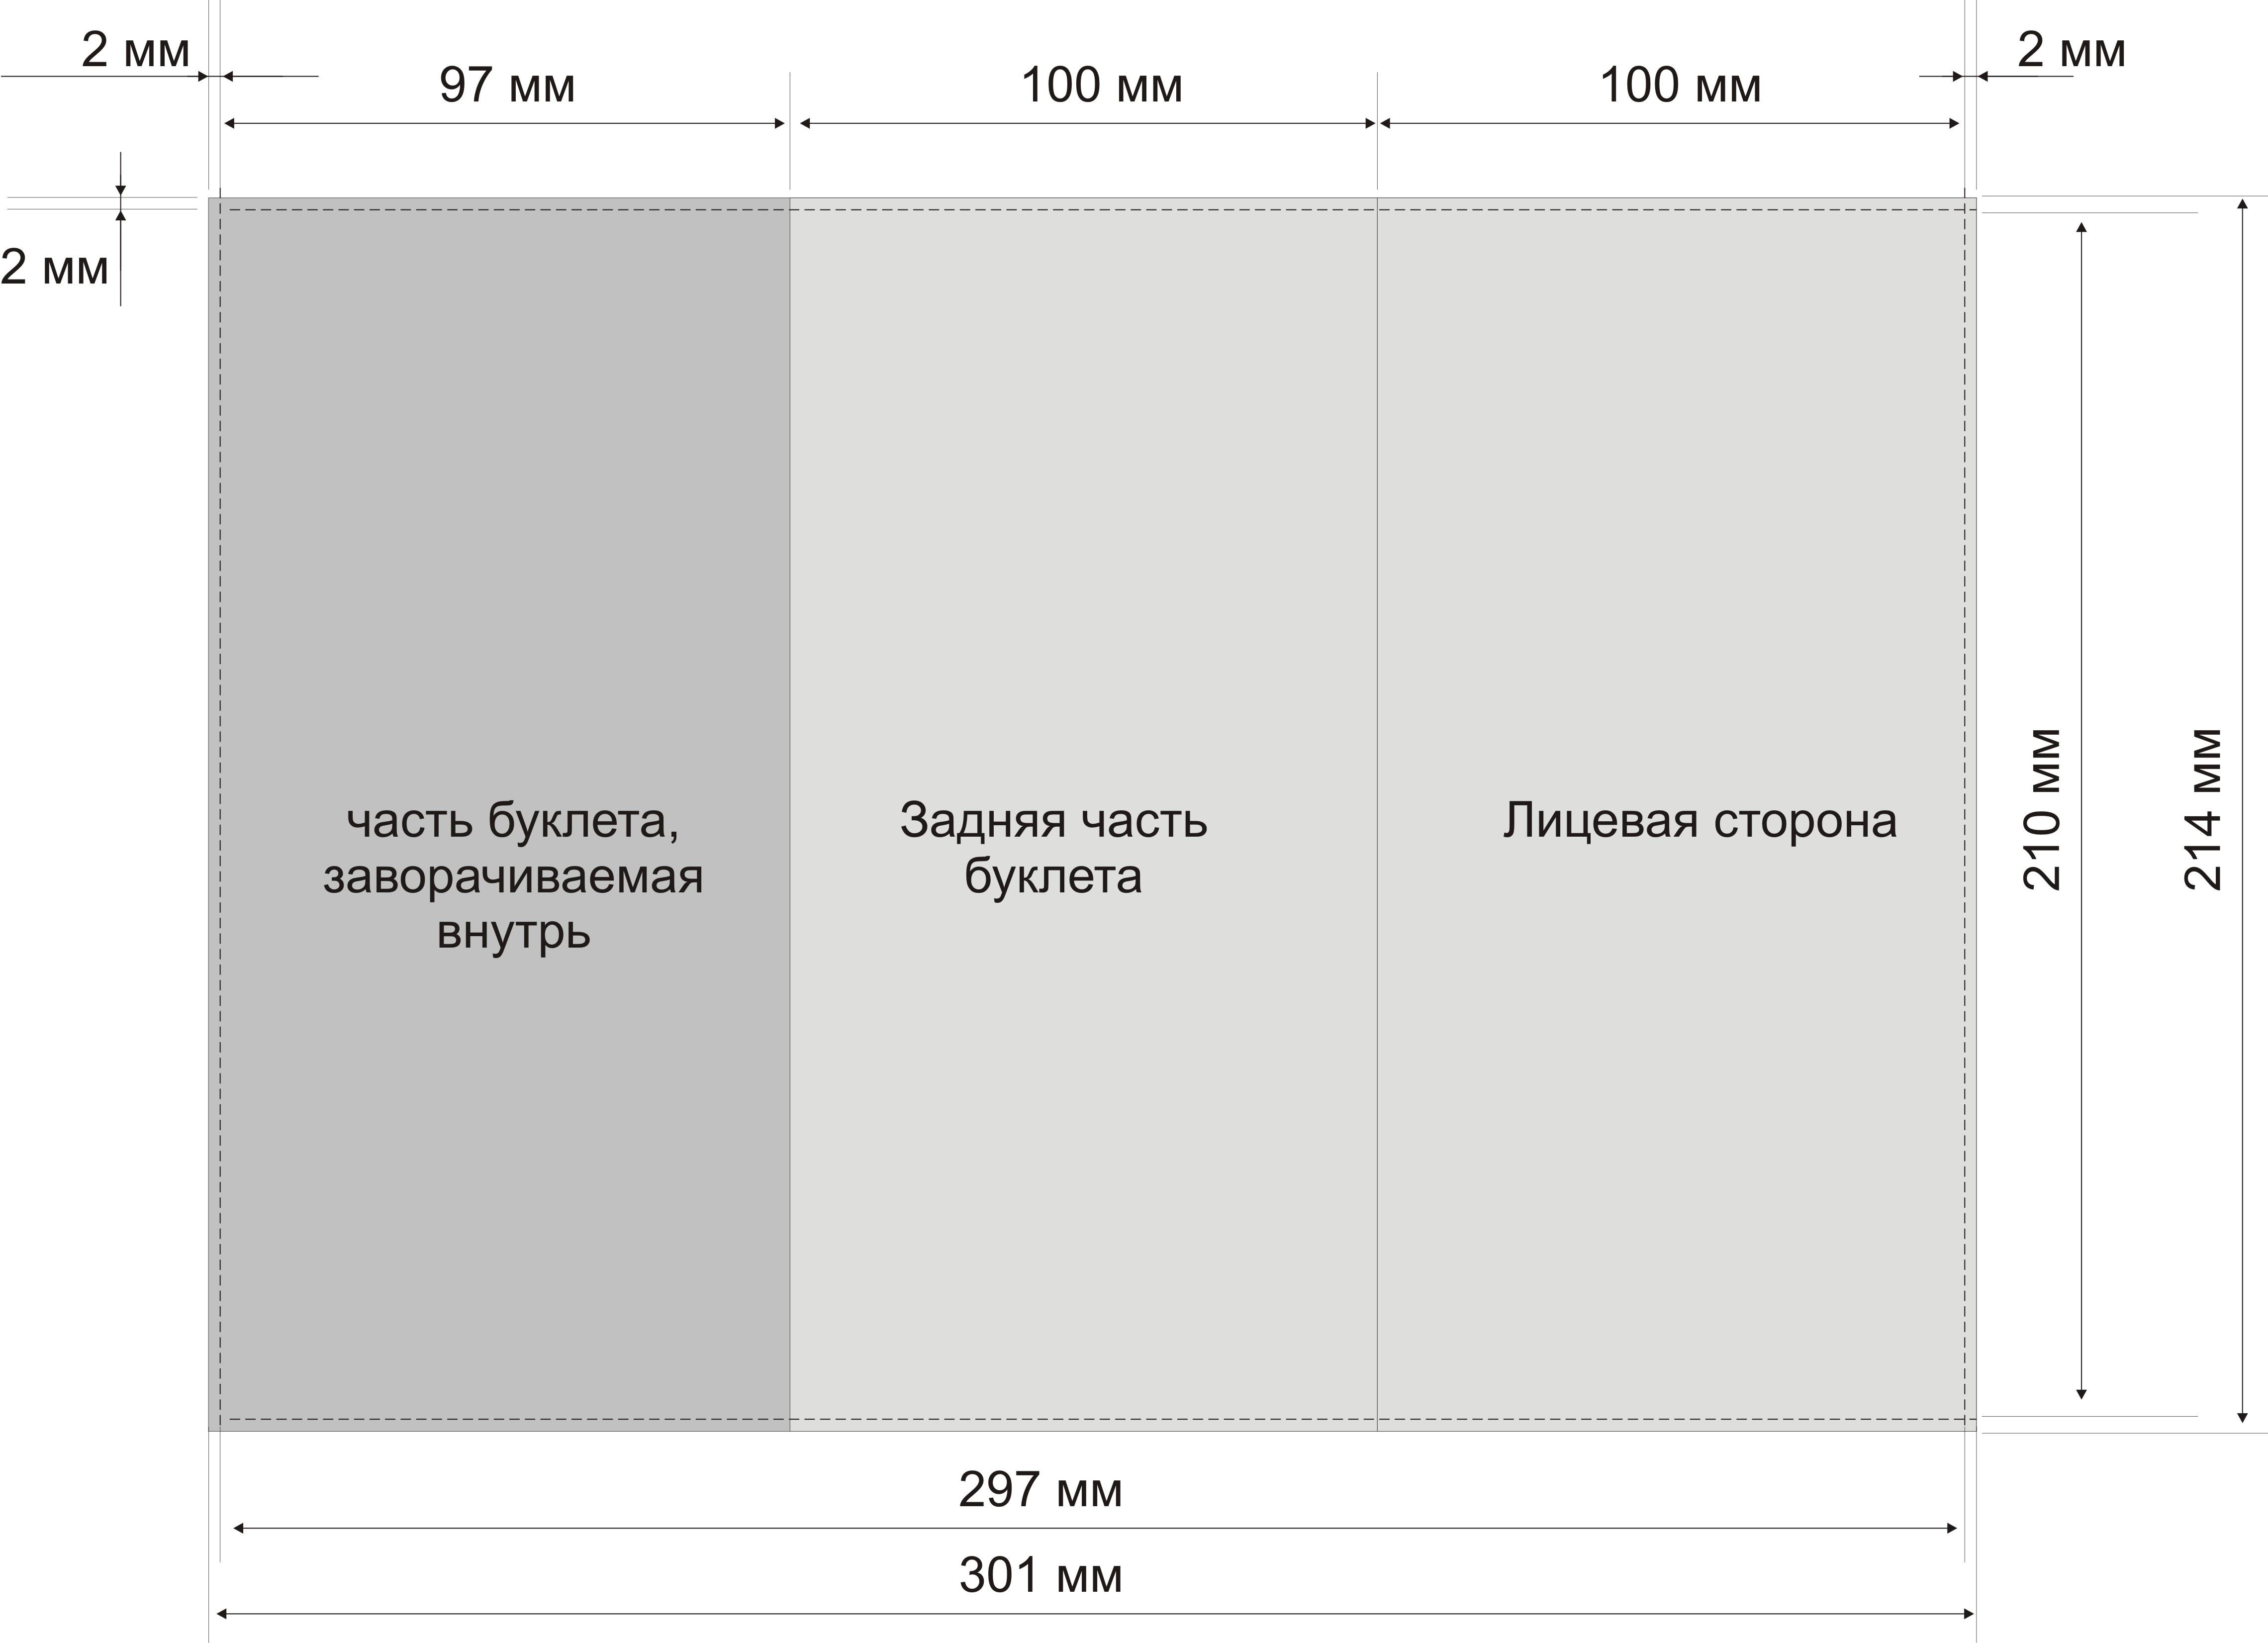 https://opt-899008.ssl.1c-bitrix-cdn.ru/images/buklet_1.jpg?1489590628568534